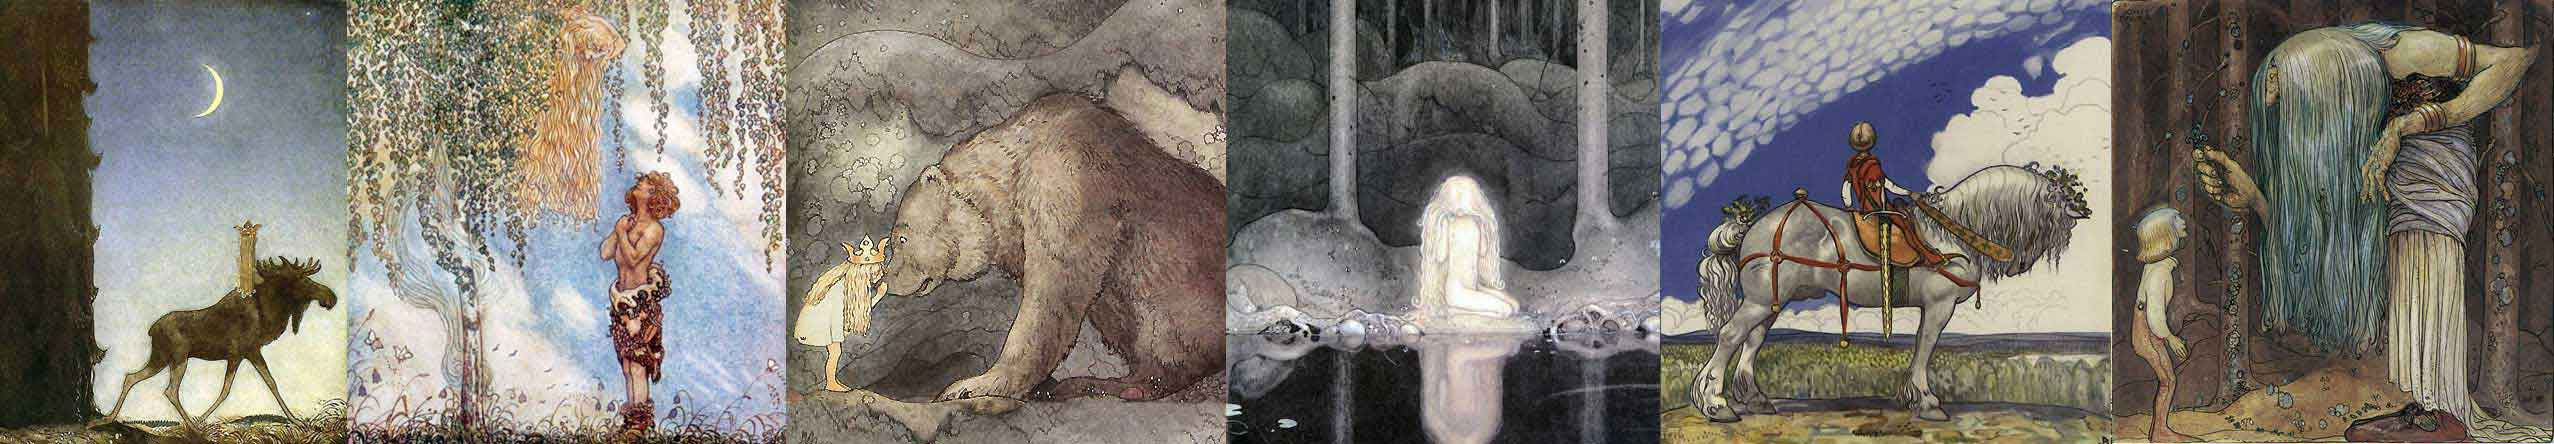 A selection of John Bauer art prints at artsycraftsy.com